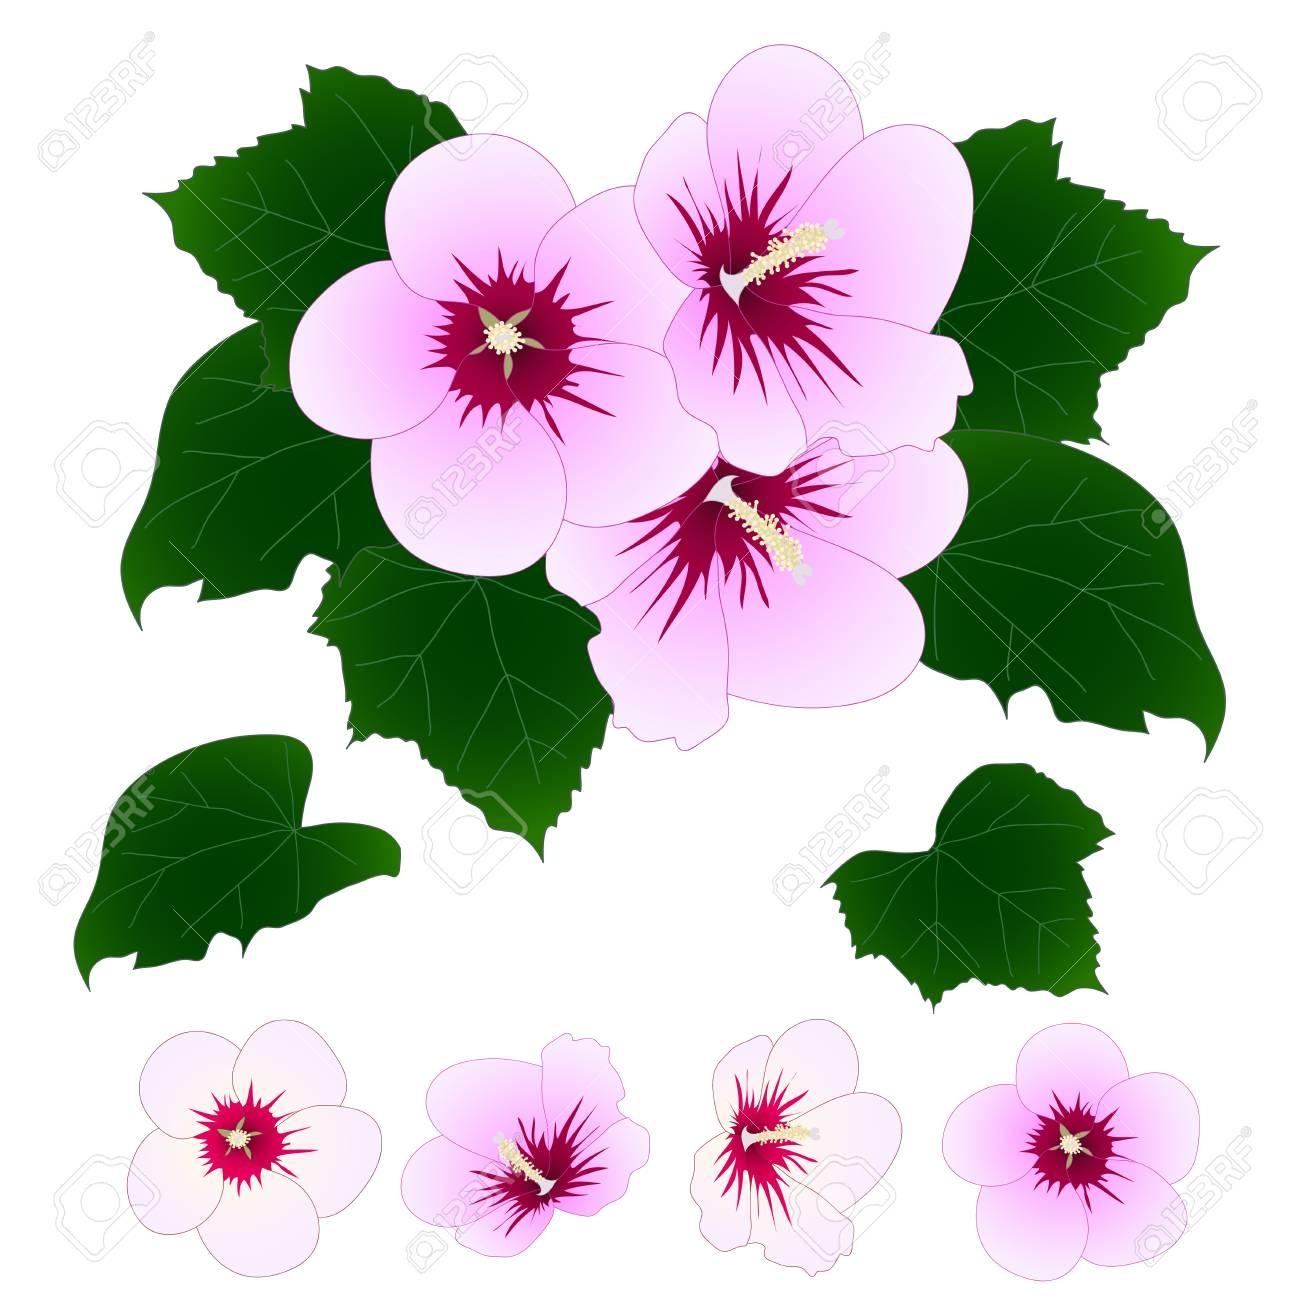 Rose Of Sharon Vector Illustration Royalty Free Cliparts Vectors